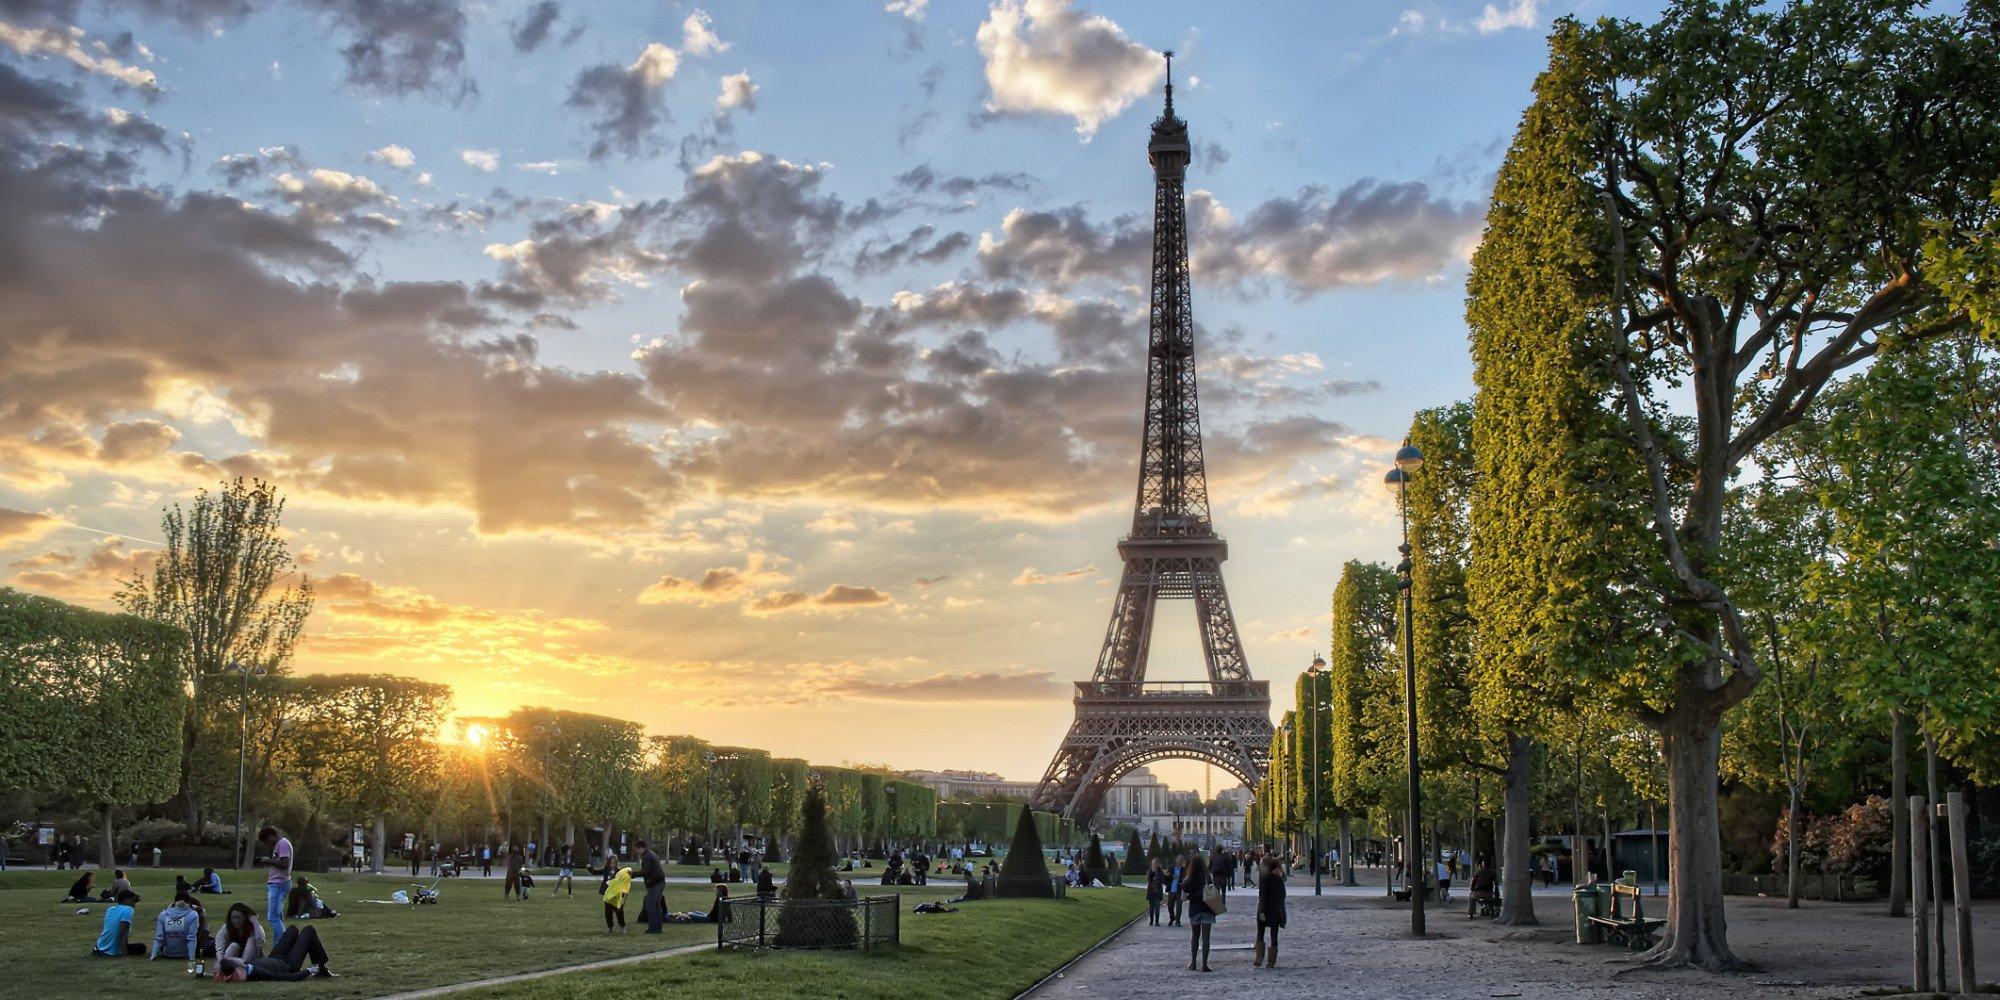 Эйфелевая Башня, Париж, Франция